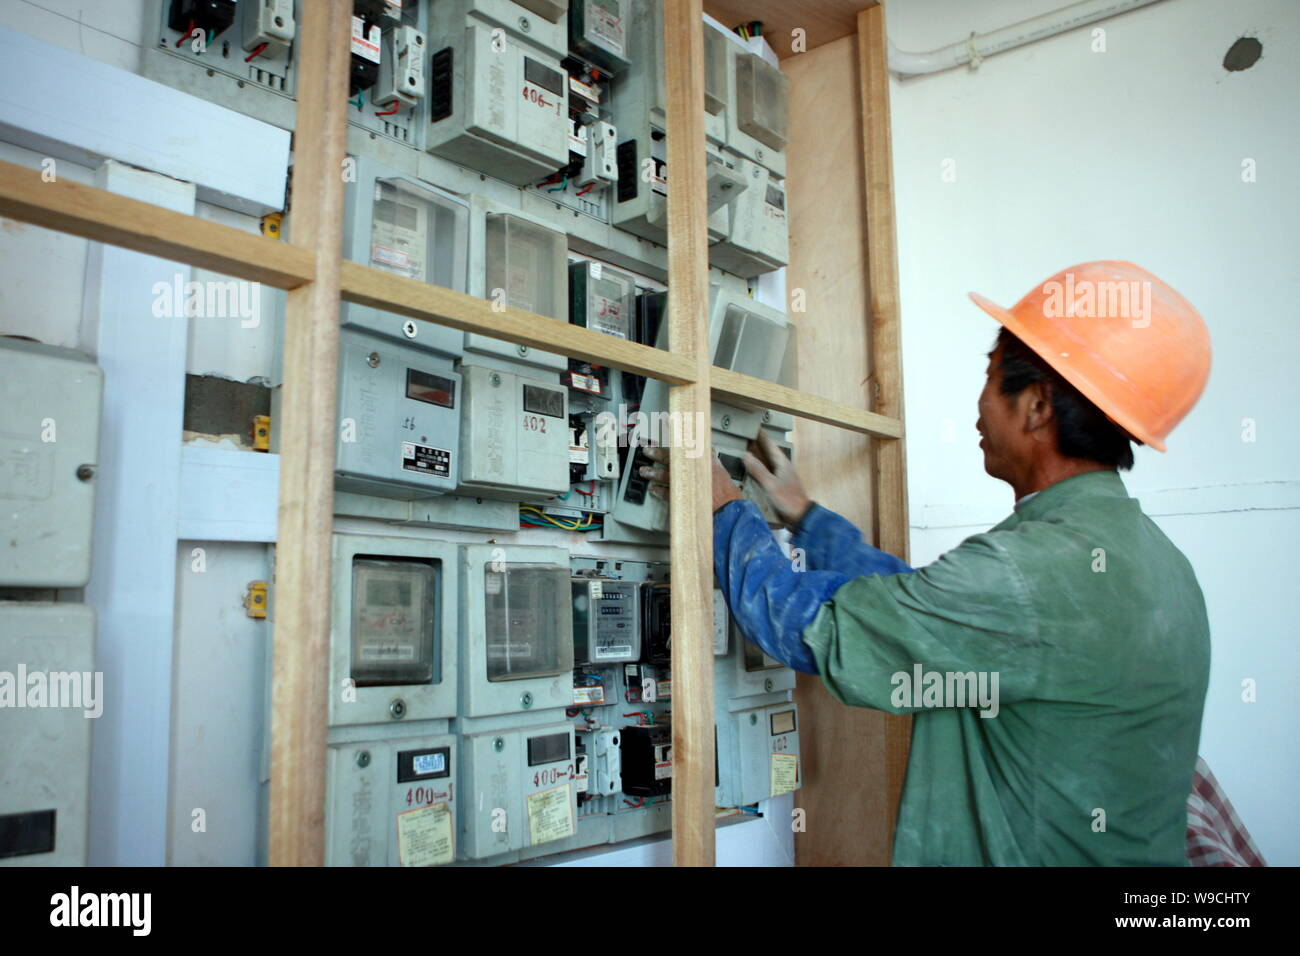 A Chinese worker checks watt-hour meters in Wukang Building